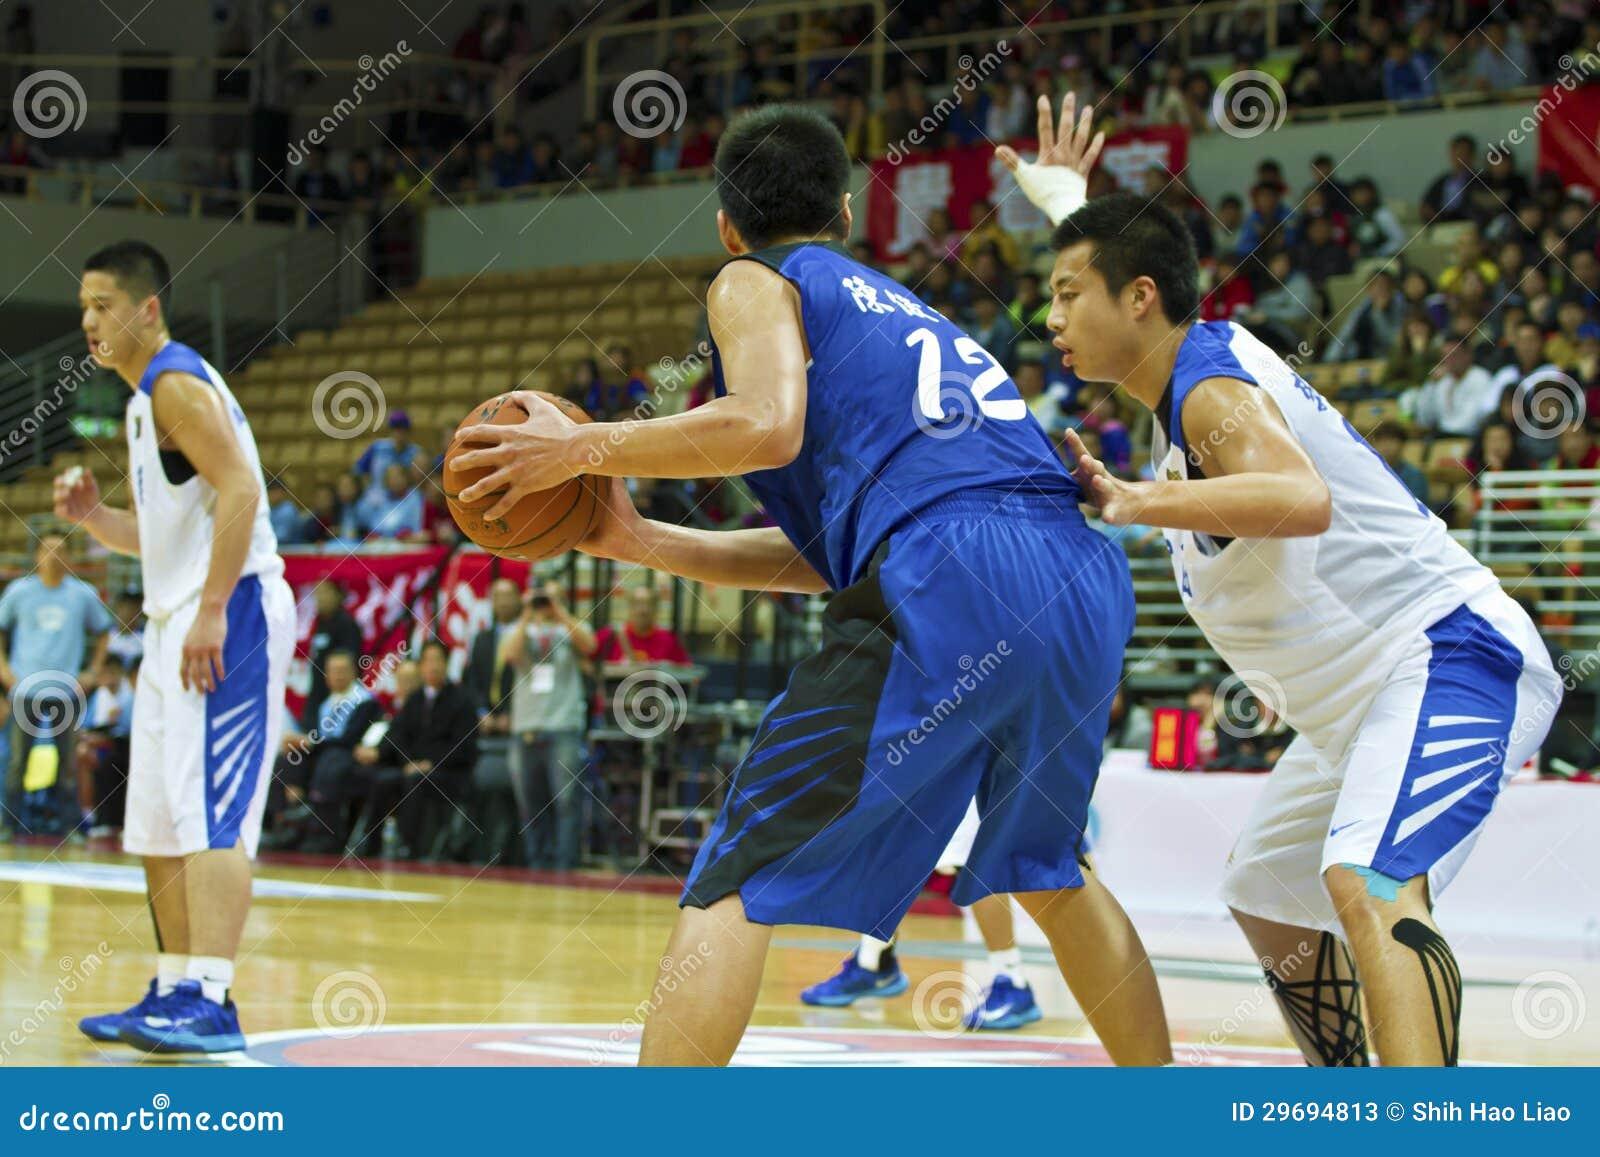 High School Basketball Games High School Basketball...